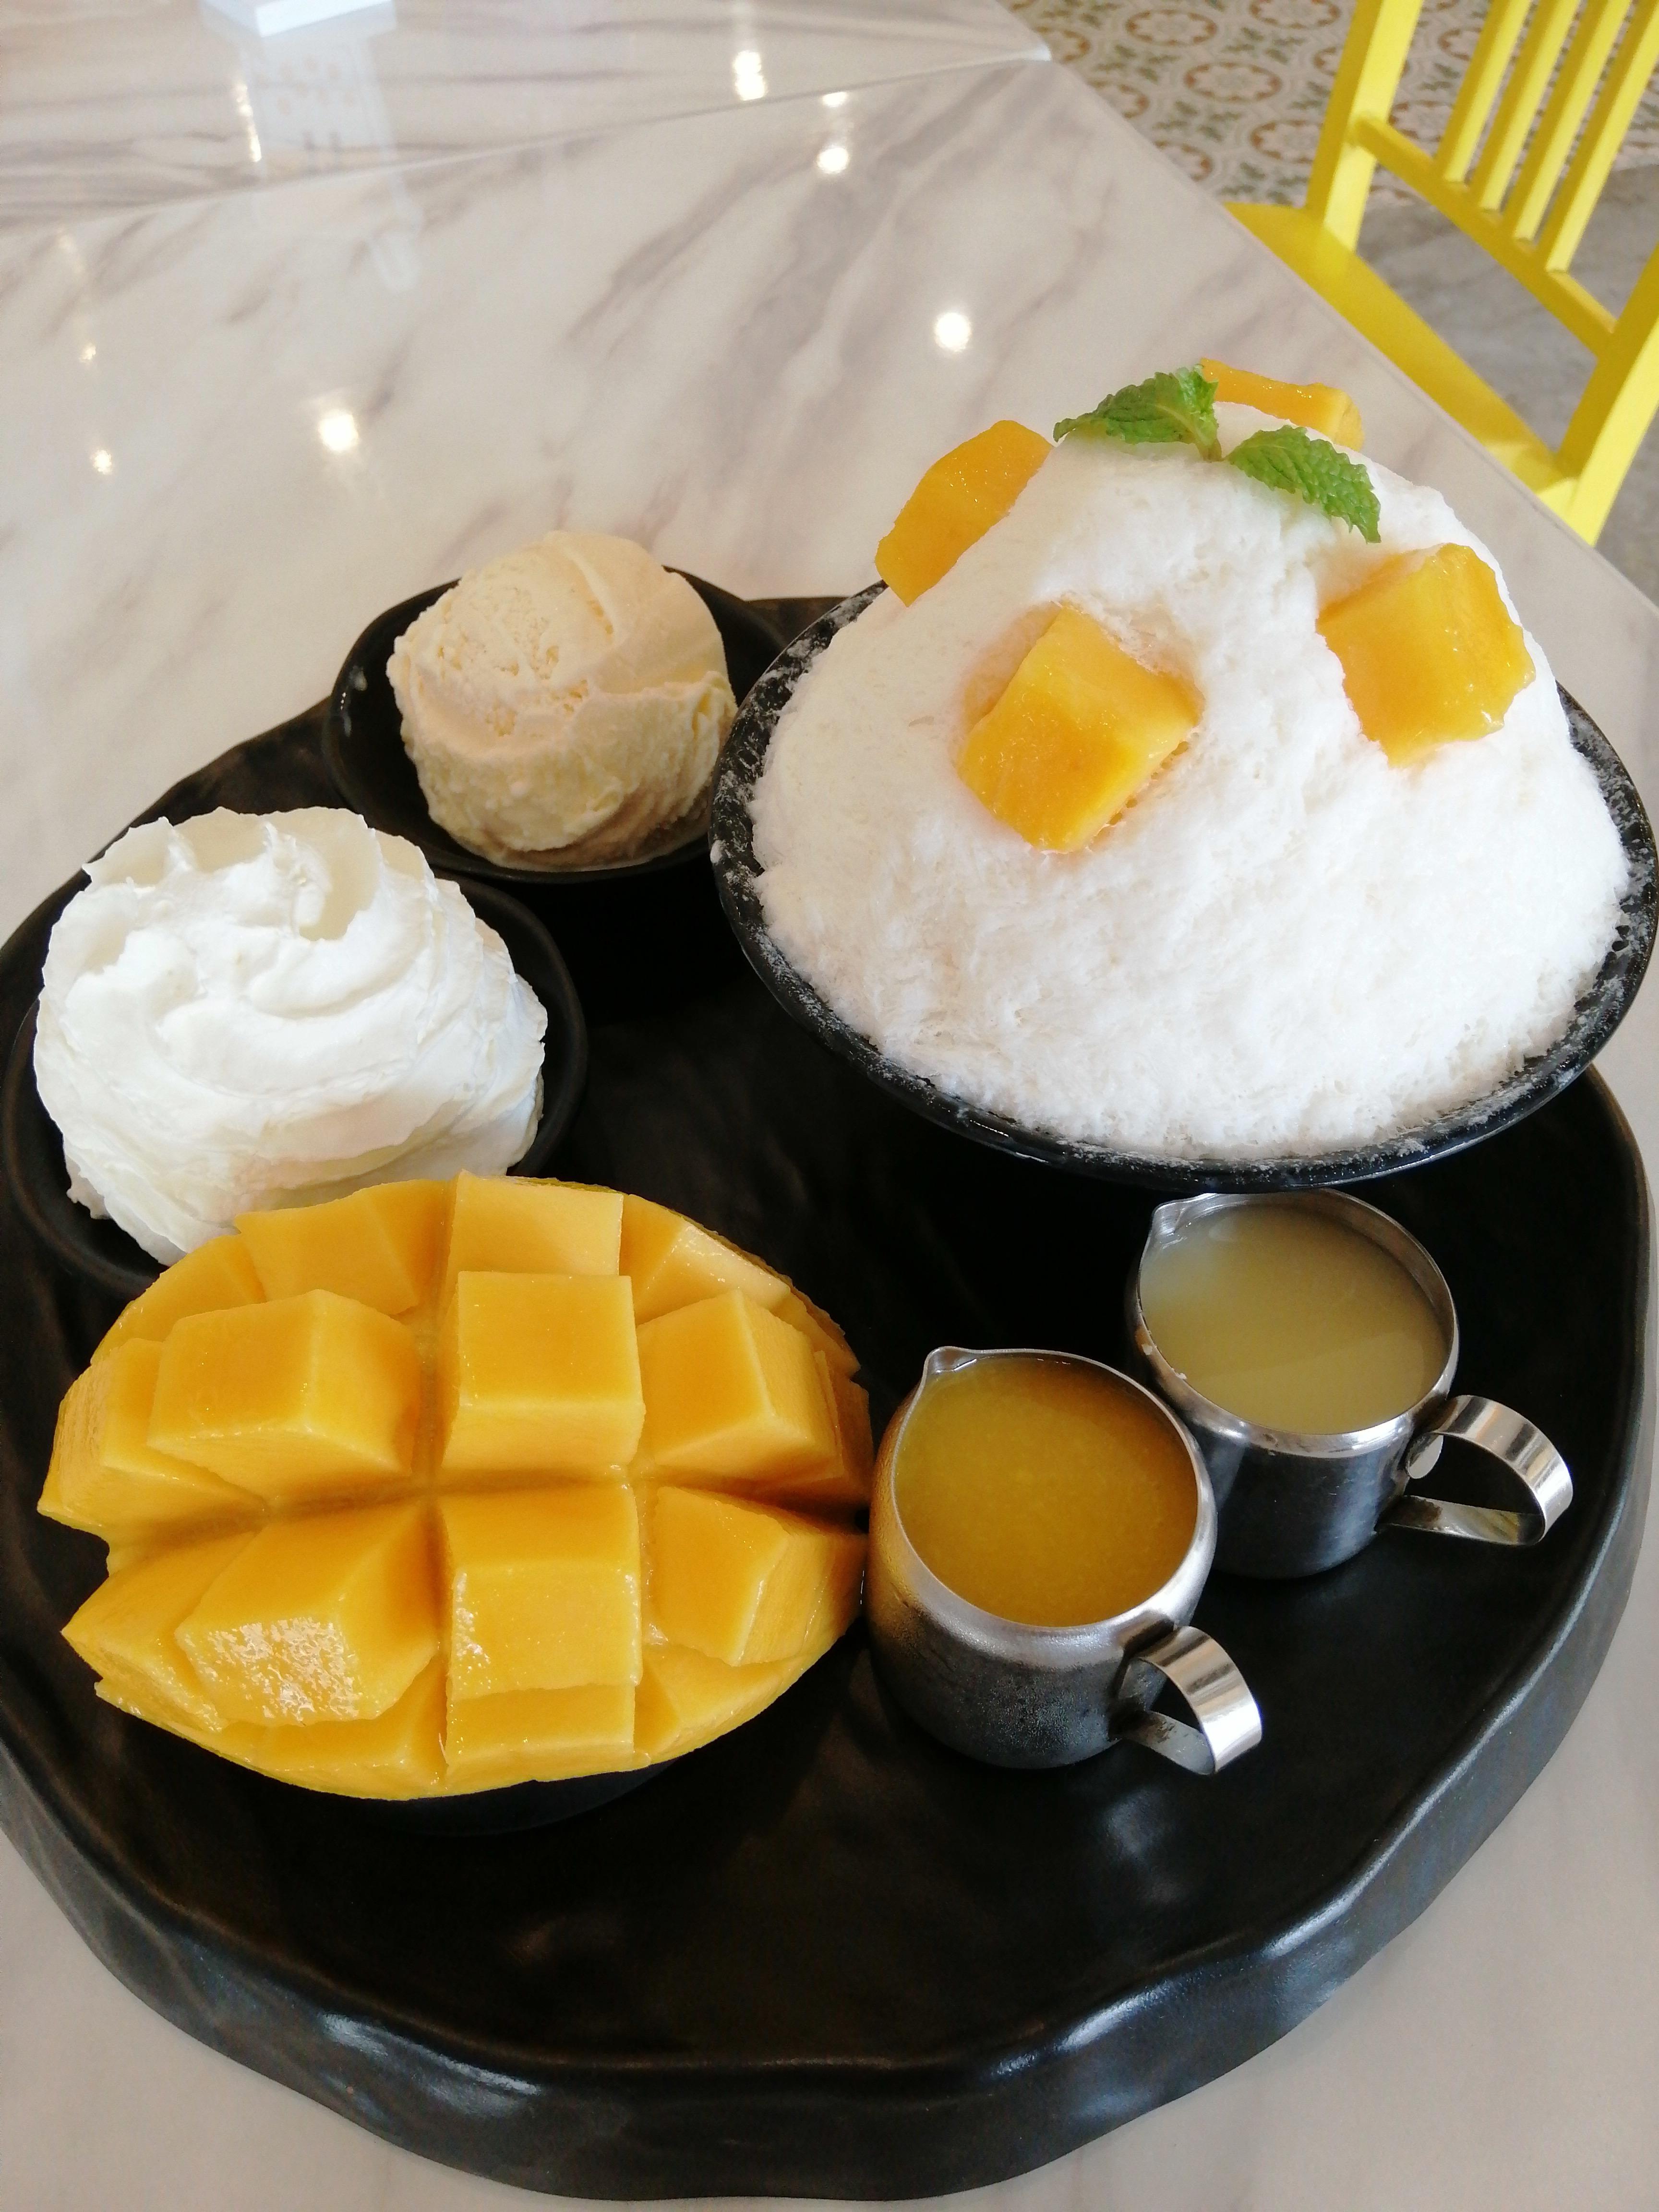 "Thai_Phuketoldtown_mellowyellow_binsu_001"""""